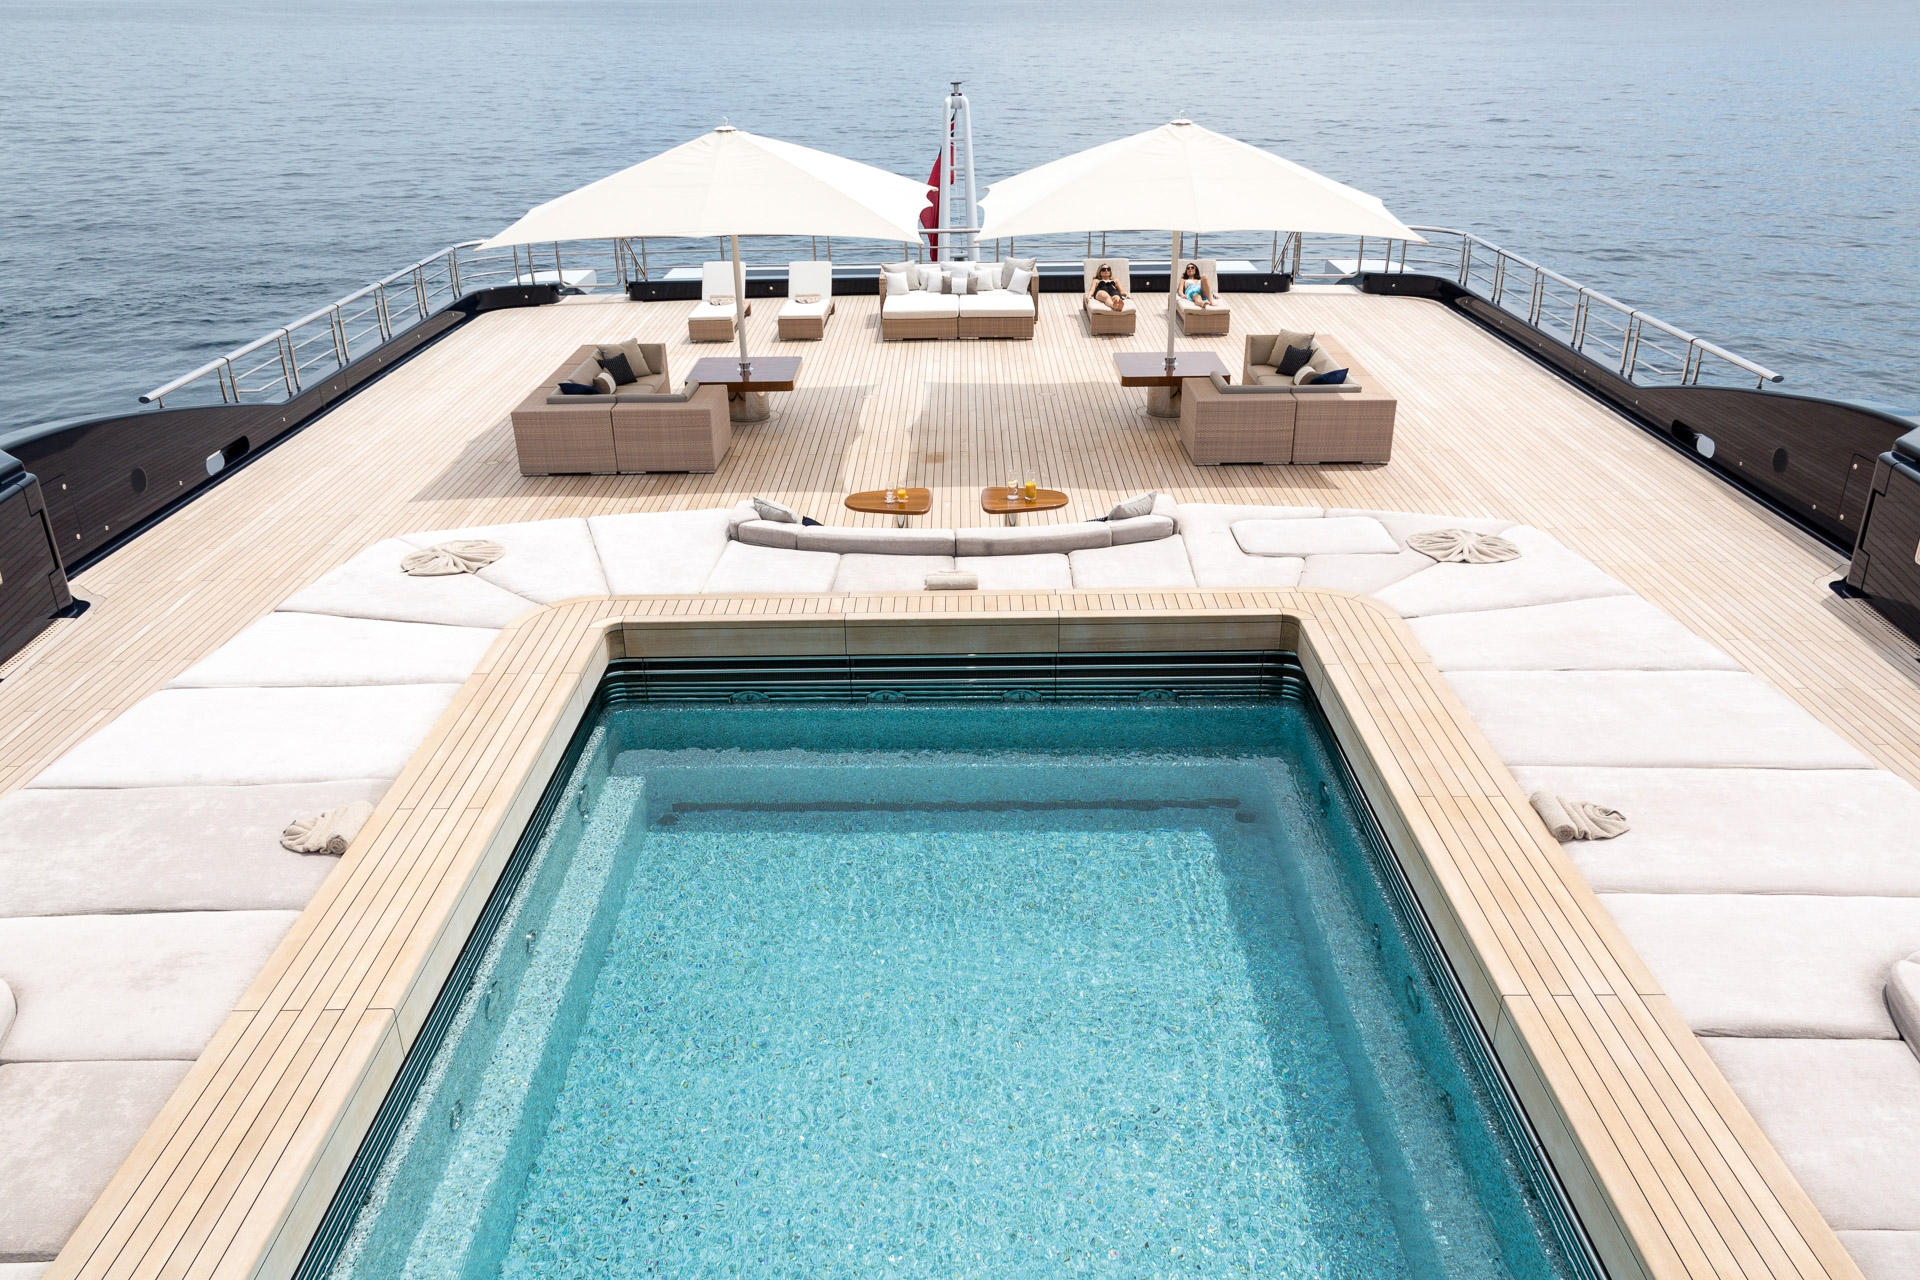 Luxury superyacht keyla interior by hot lab luxury yacht charter - Explorer Yacht Luna S Aft Pool